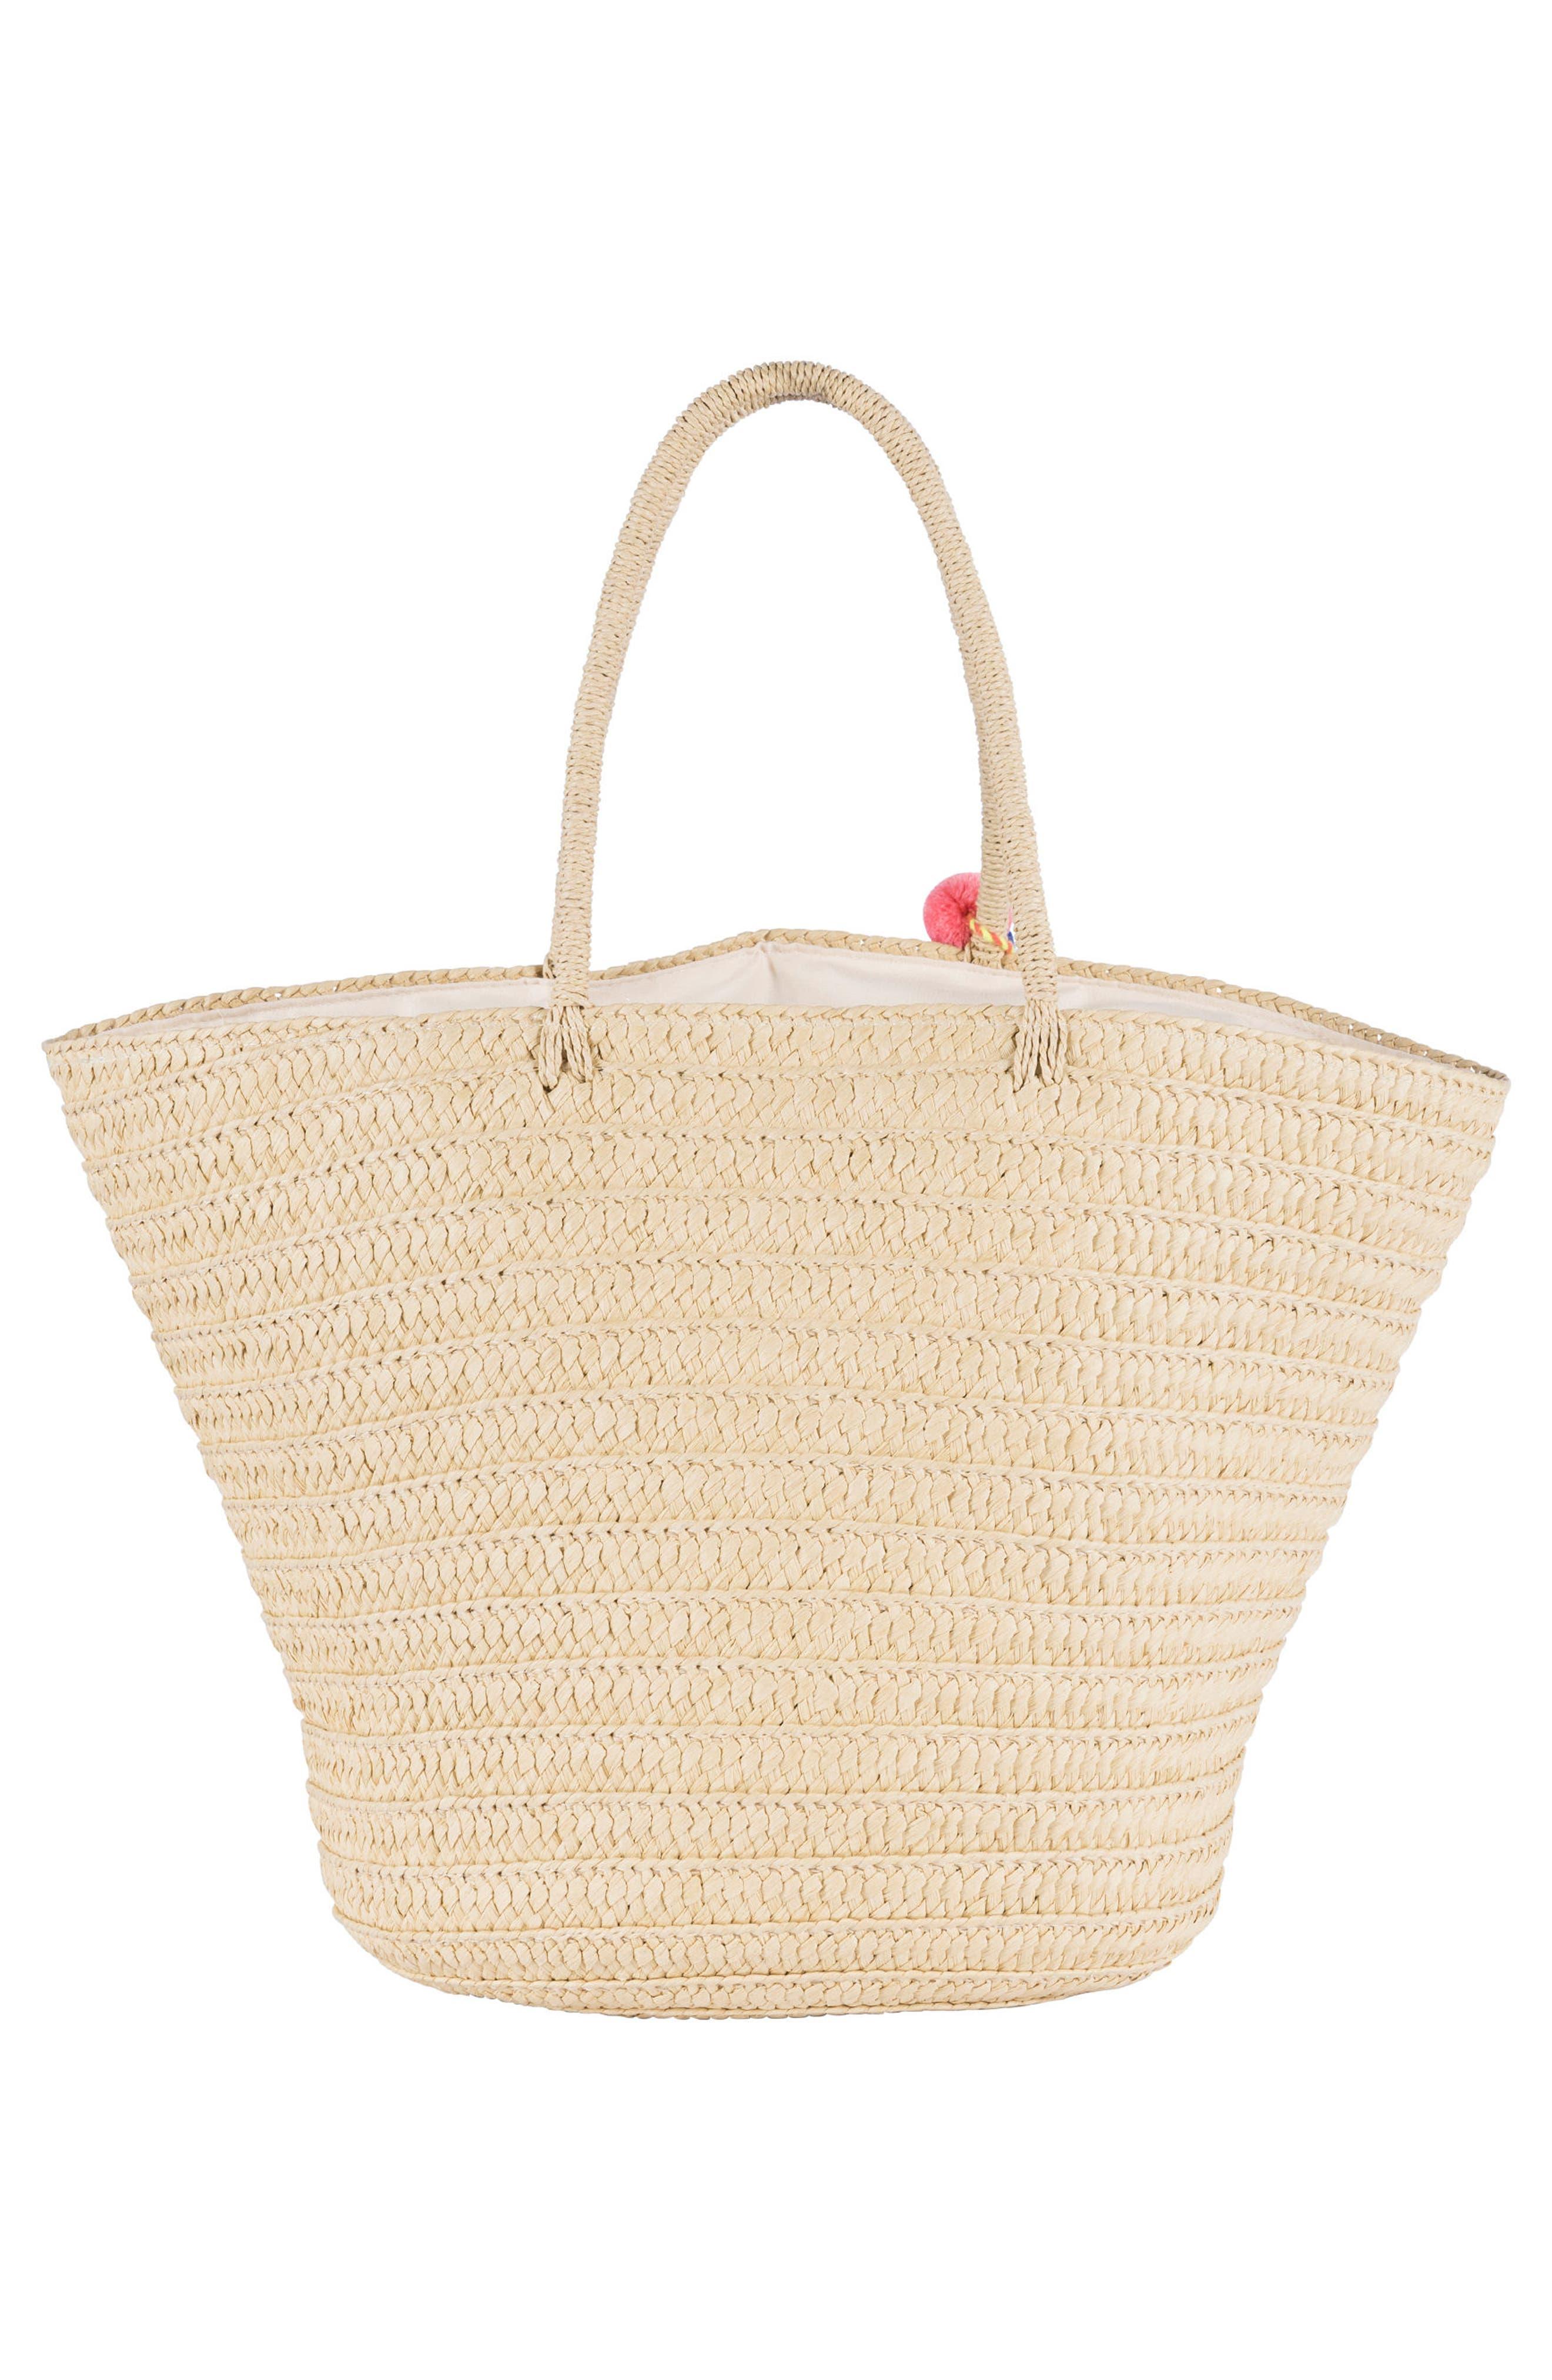 Beach Bazaar Straw Bag,                             Alternate thumbnail 2, color,